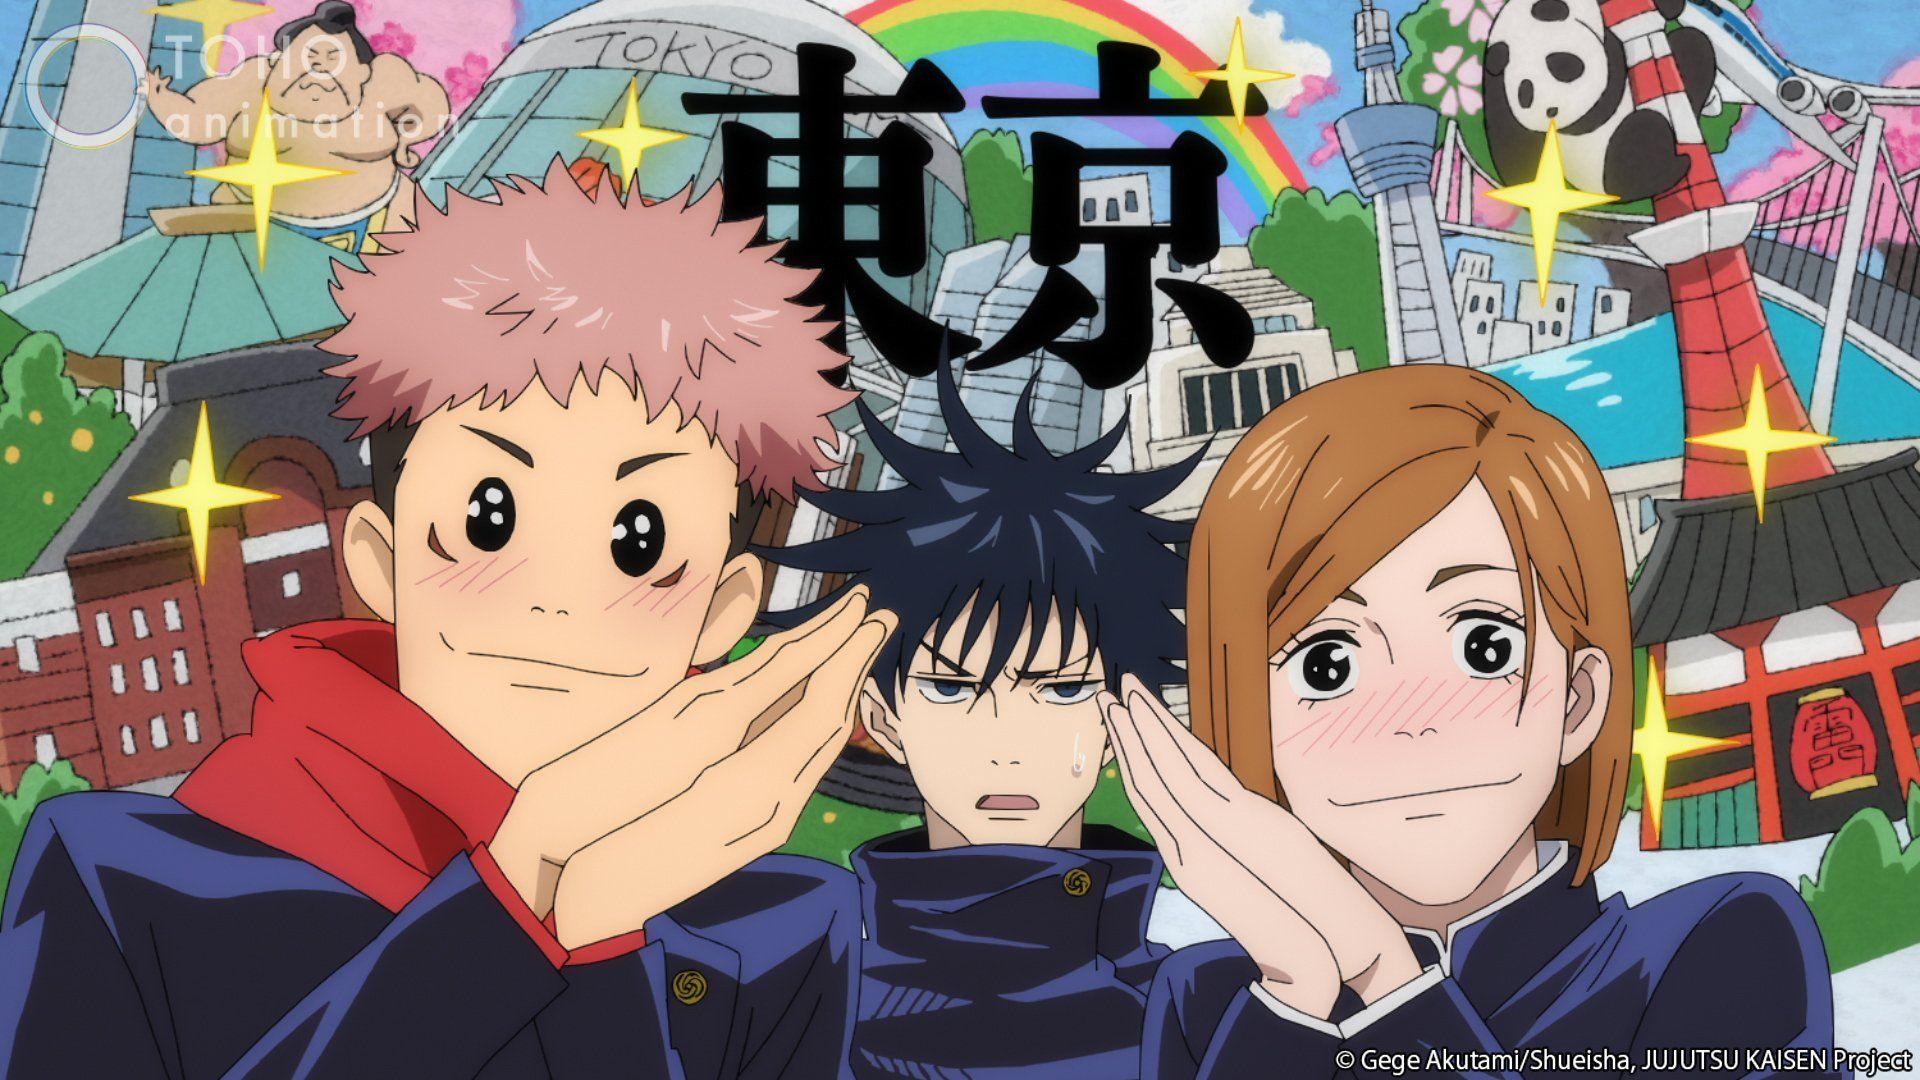 What Is Gojo Satoru S Zodiac Sign And Personality Jujutsu Kaisen Anime Trivia Fun Facts In 2021 Fun Facts Jujutsu Zodiac Signs